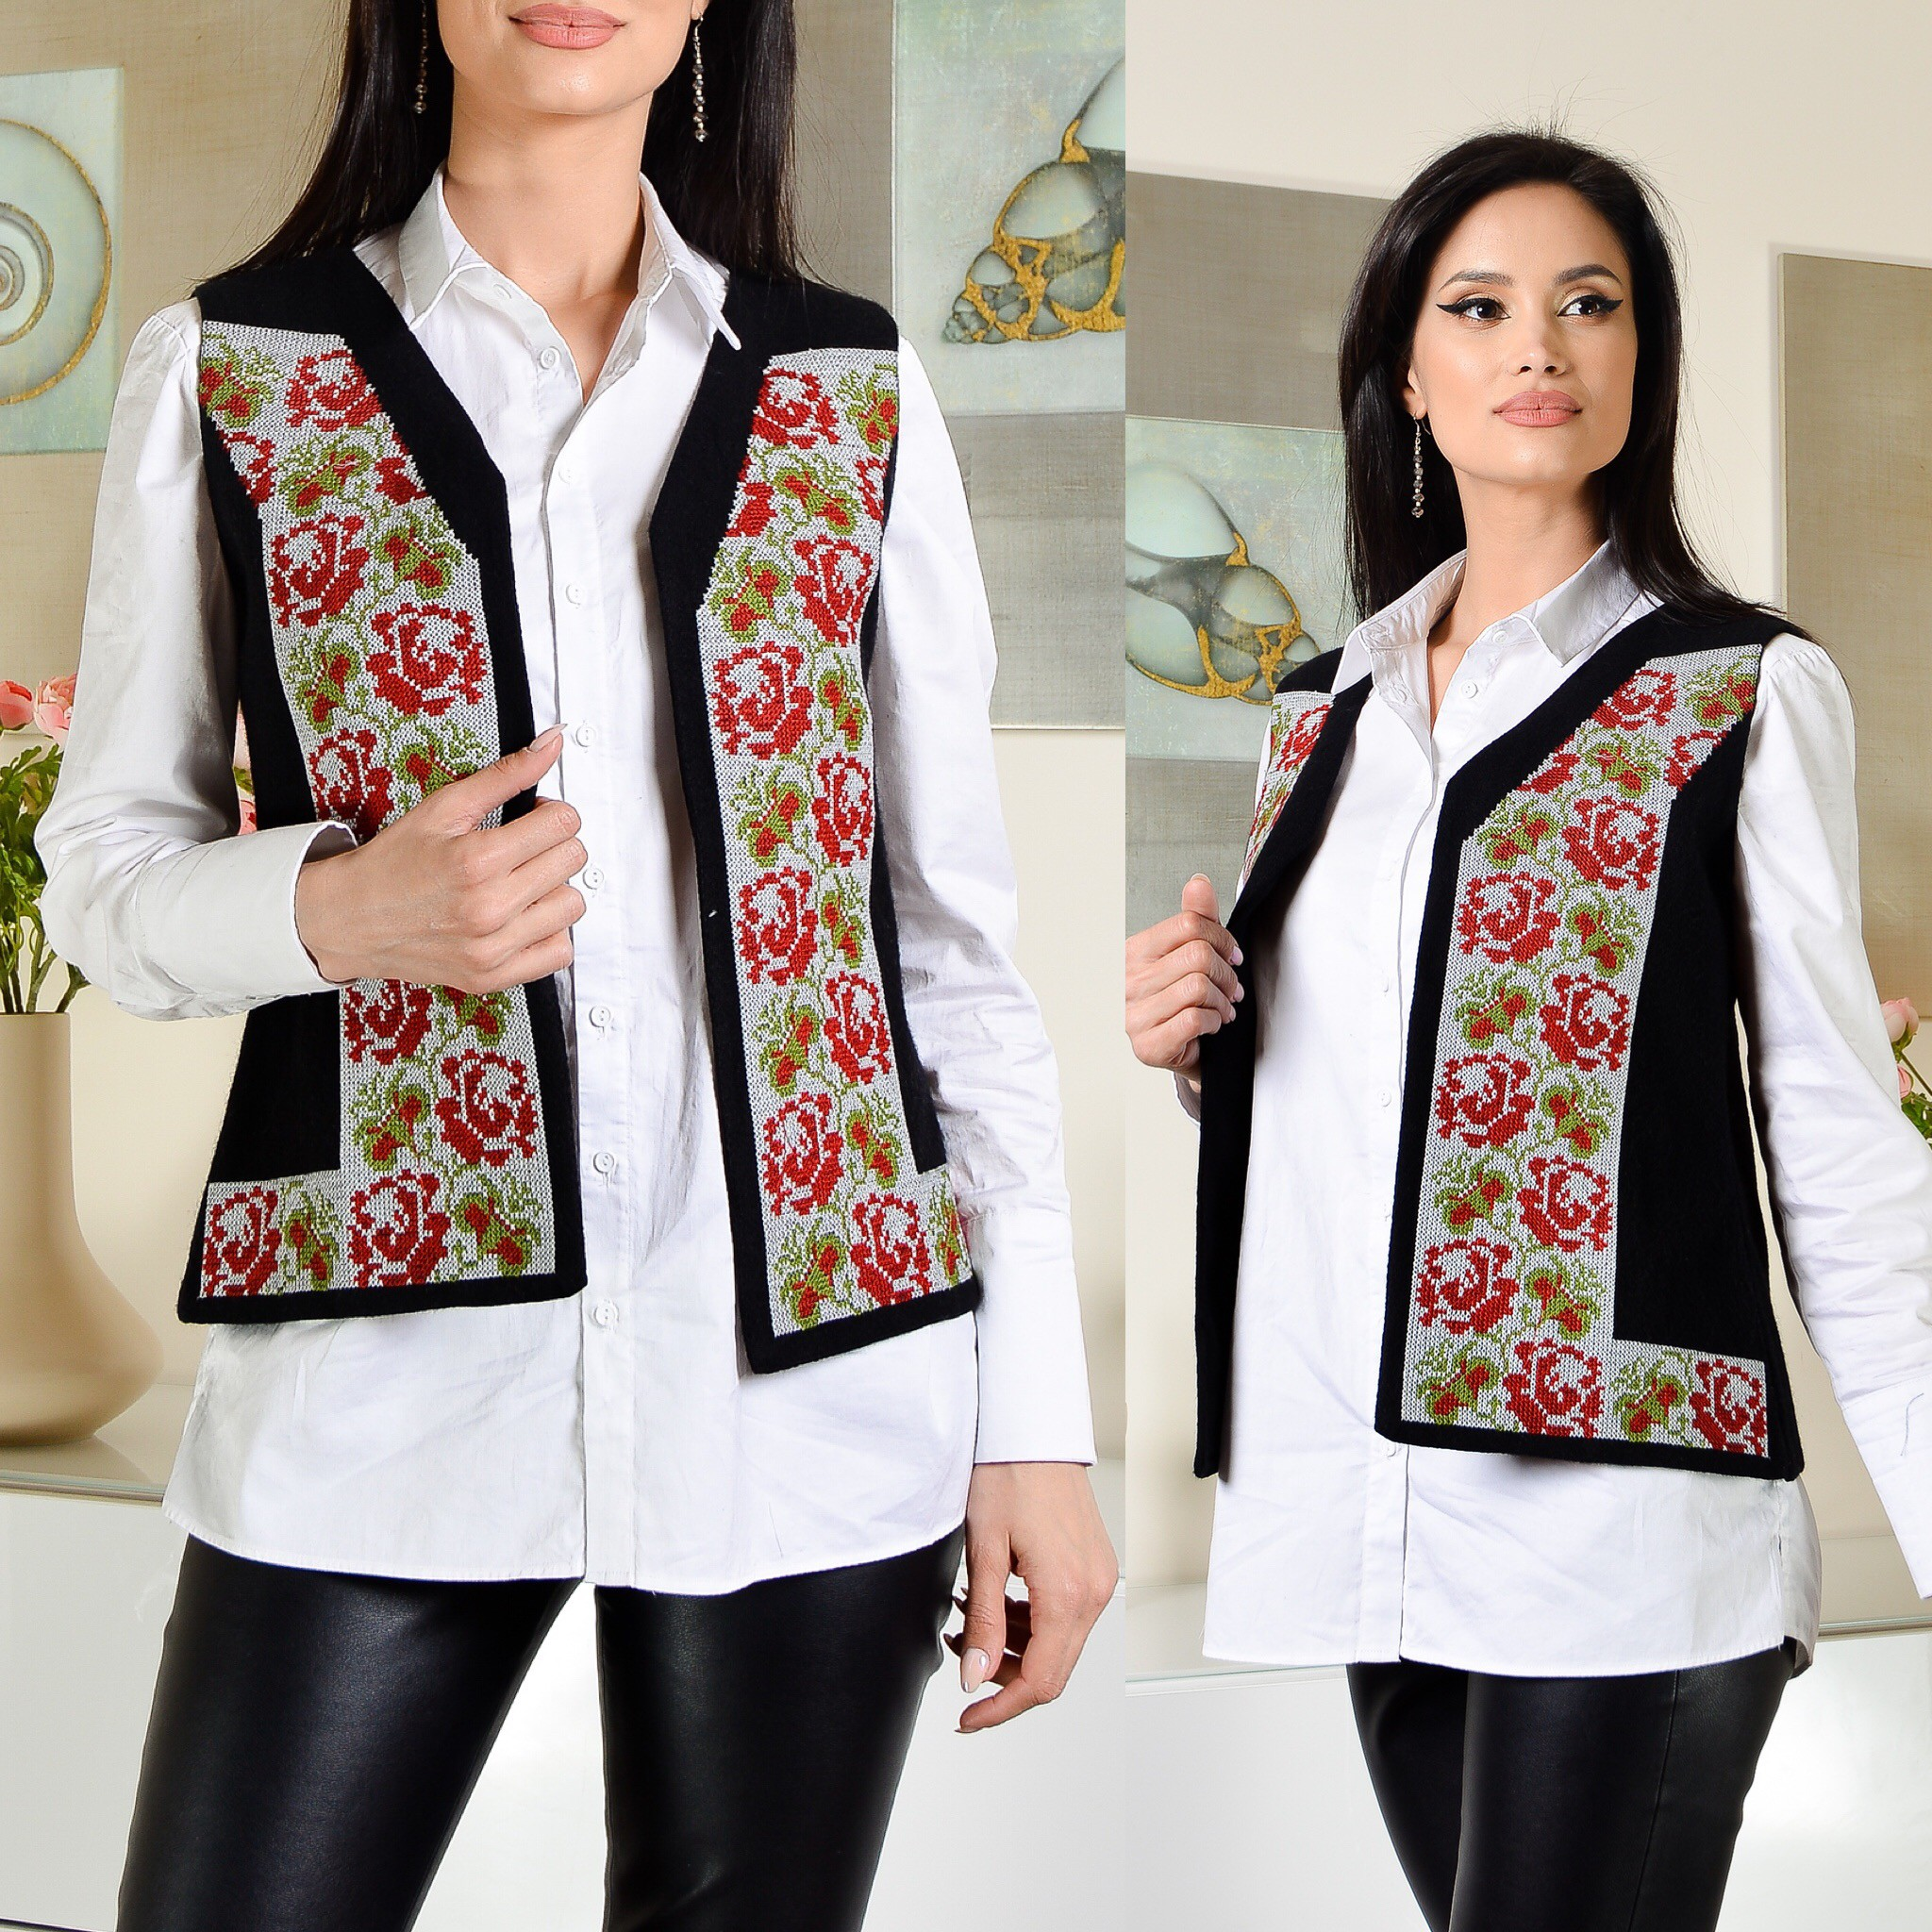 Vesta traditionala cu model floral brodat - Ecaterina